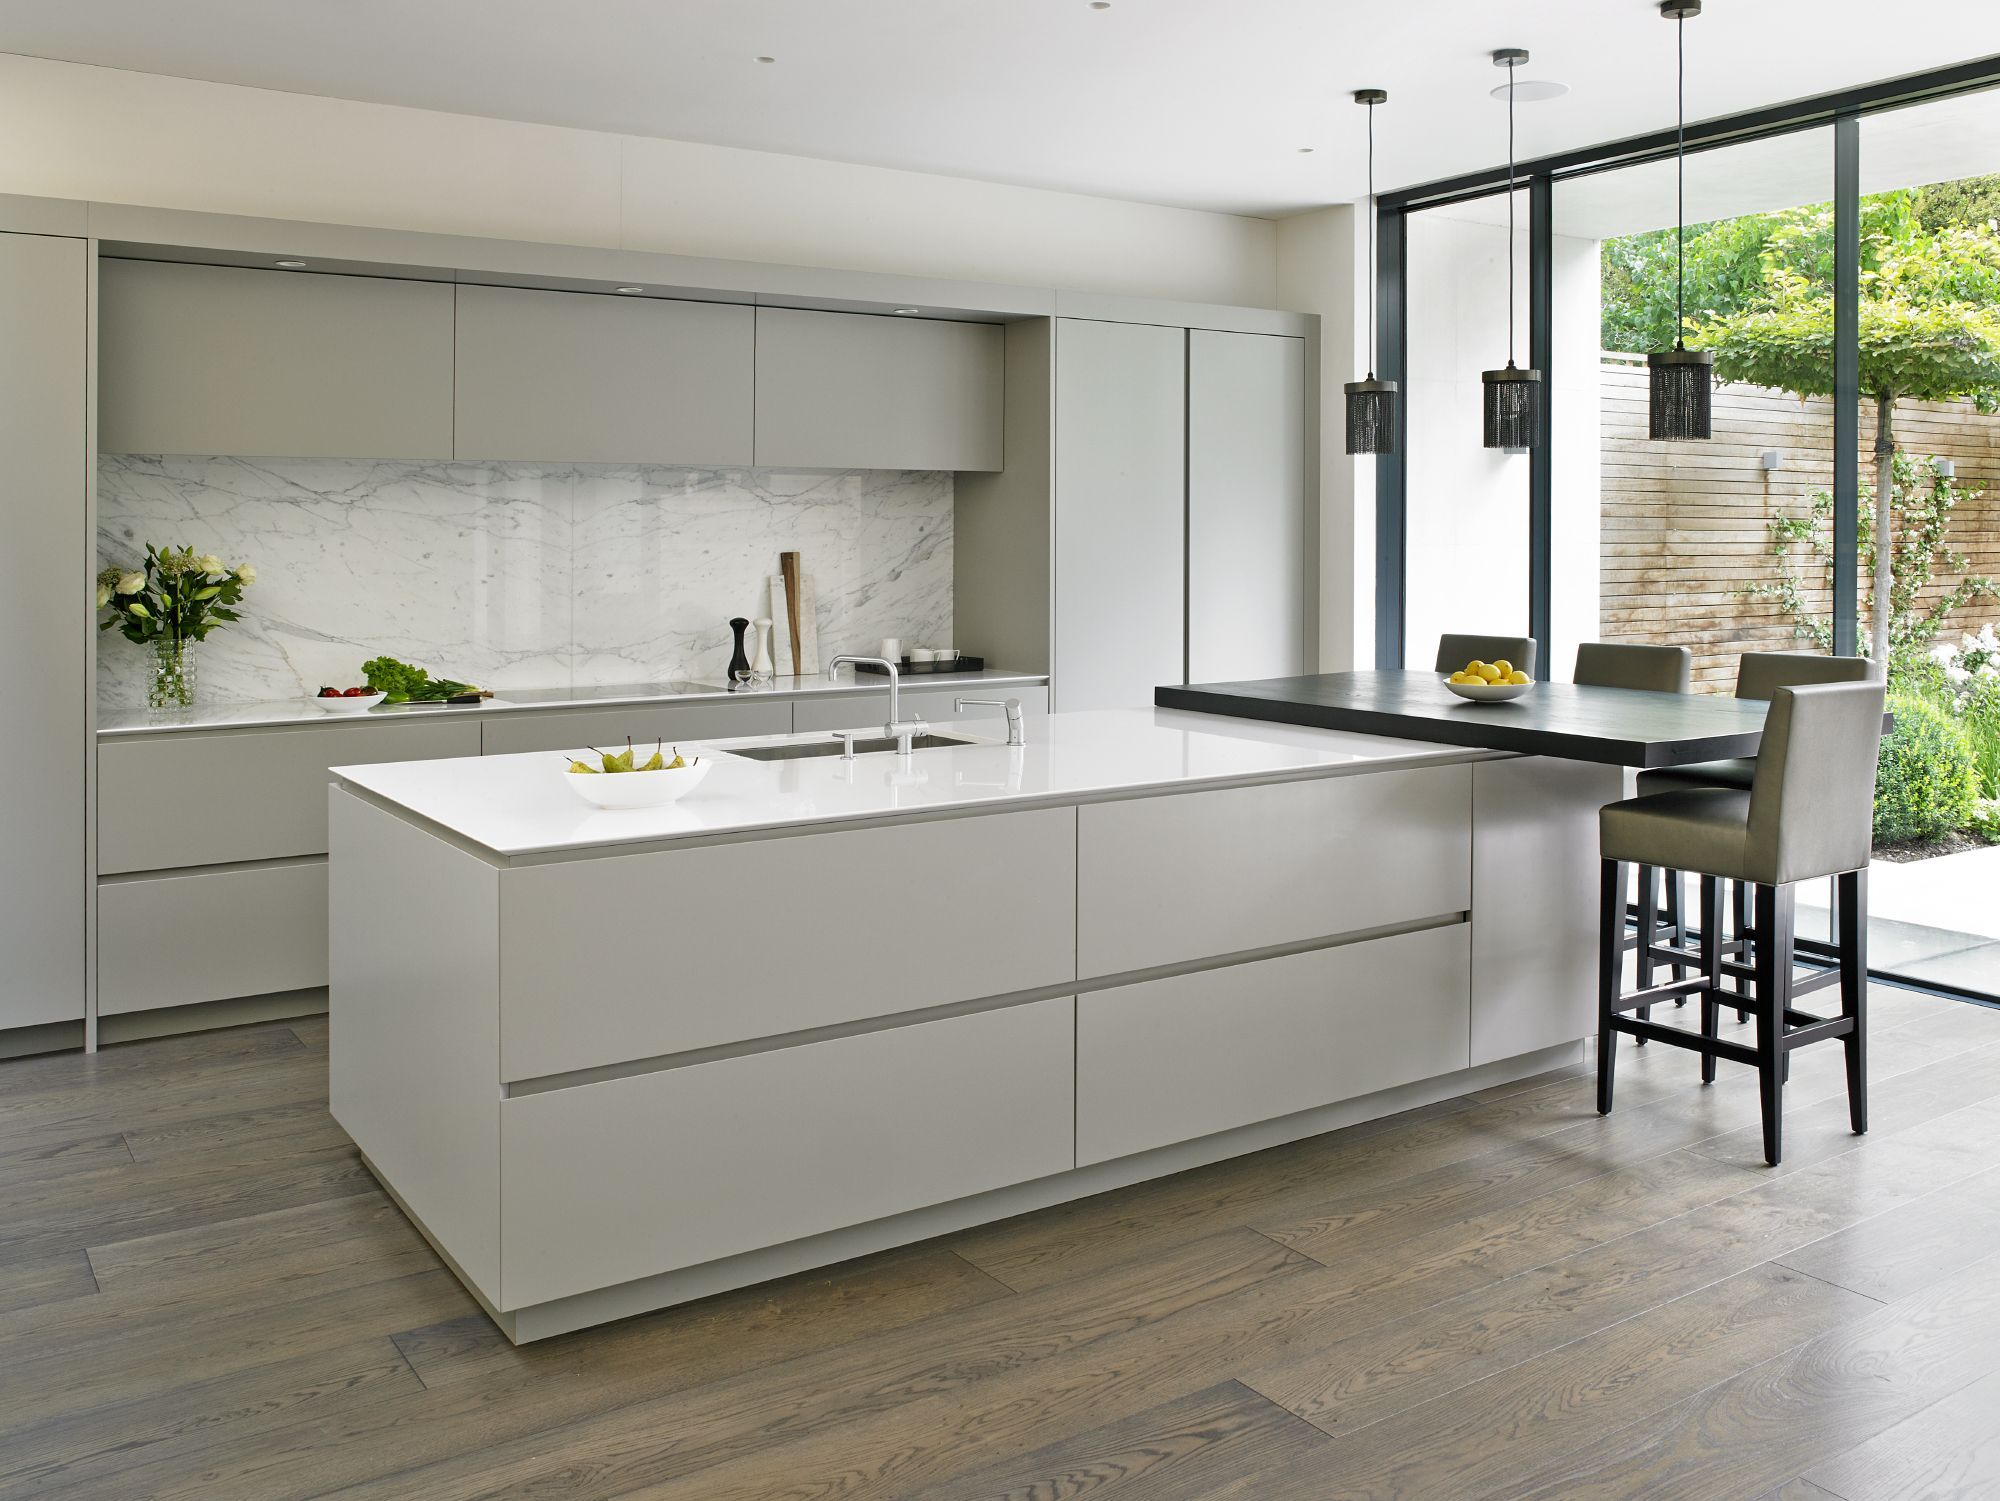 Best Wandsworth Family Kitchen Bespoke Kitchens Sw London In 400 x 300